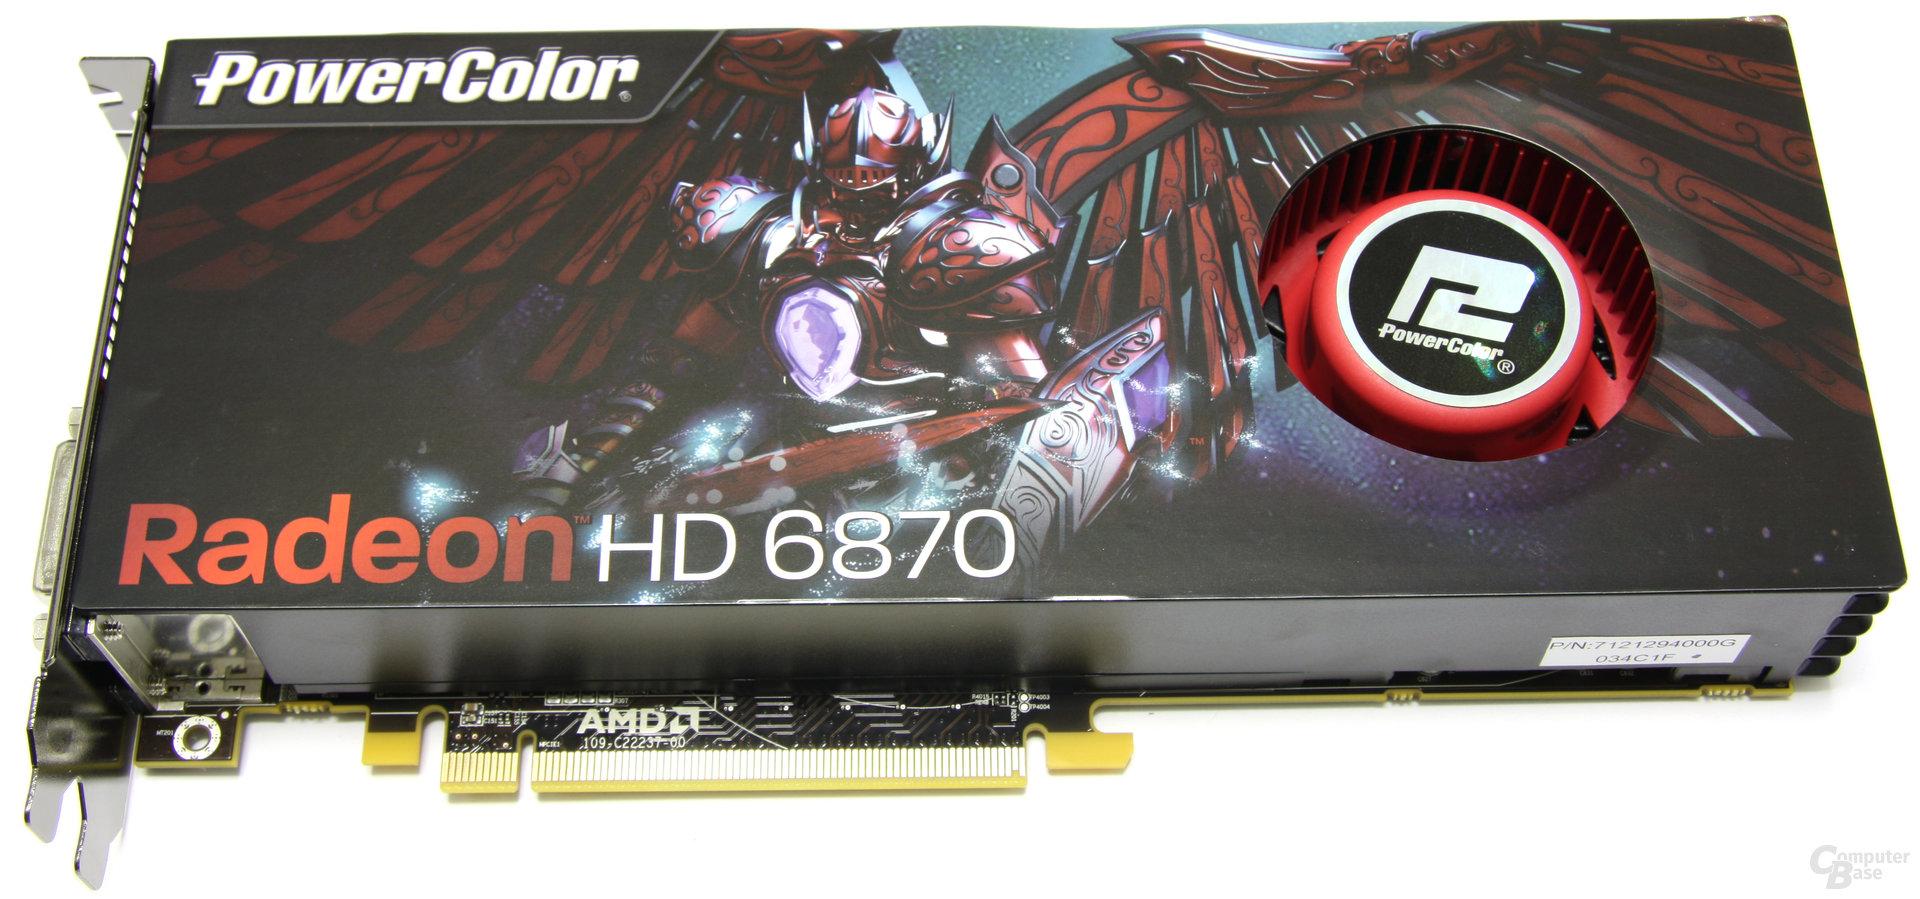 PowerColor Radeon HD 6870